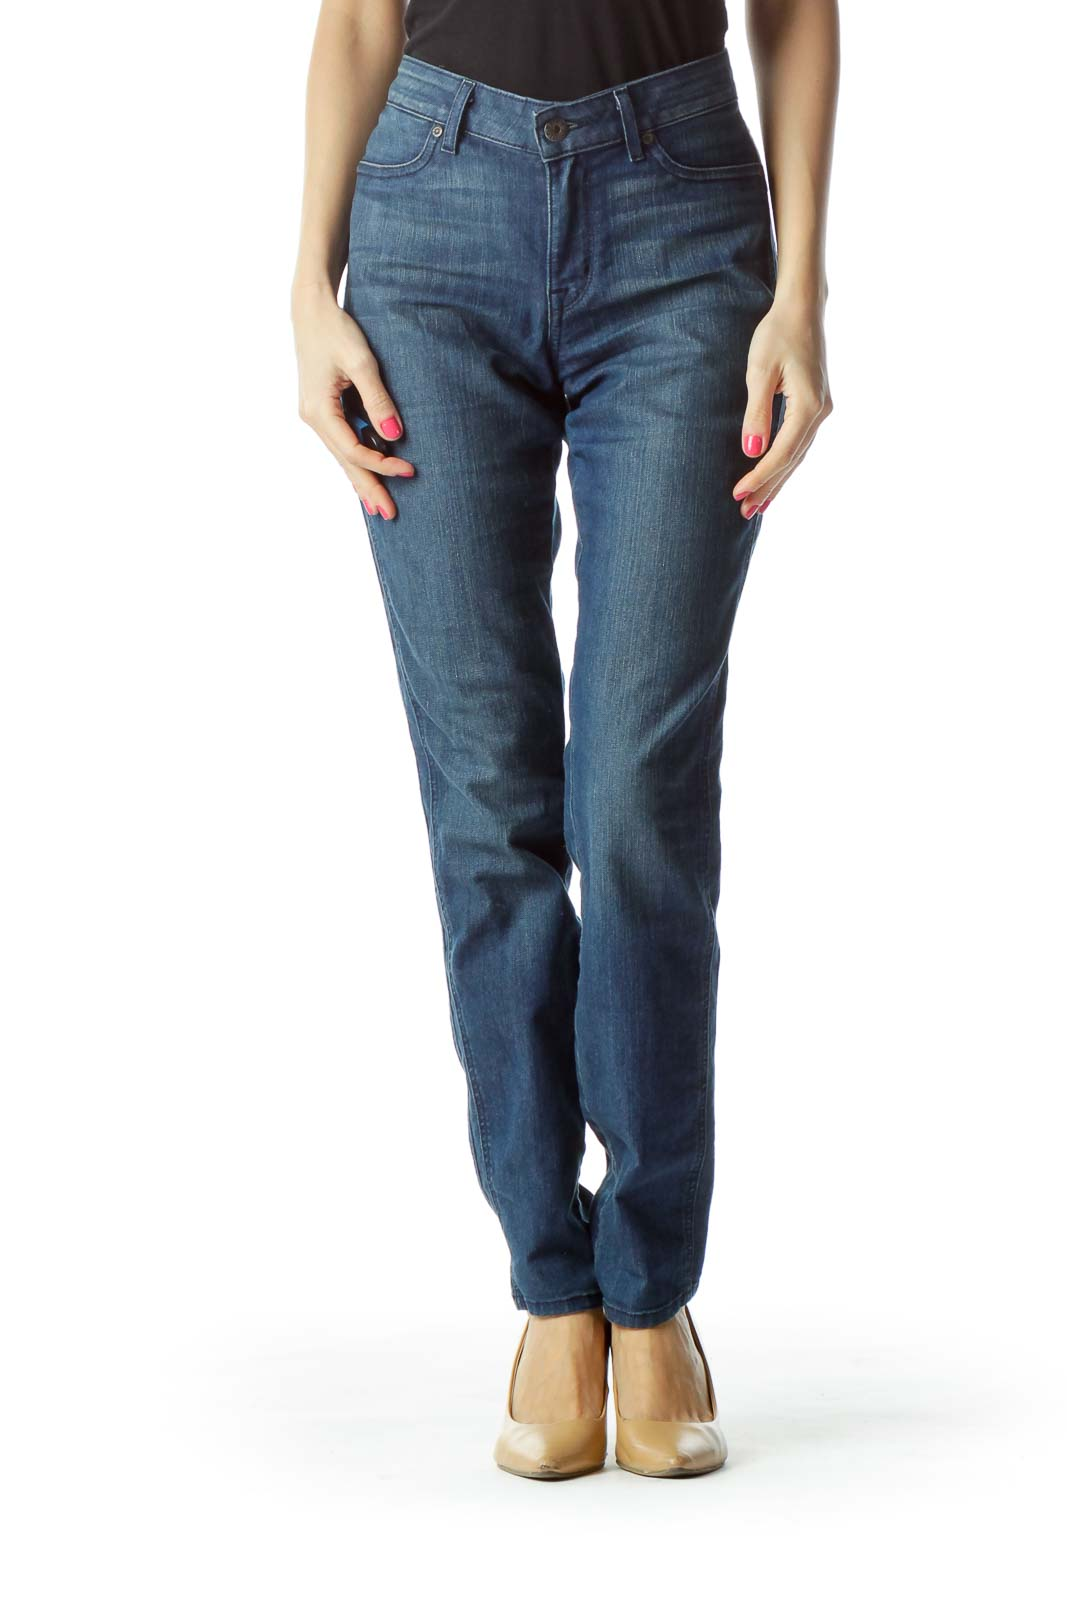 Blue Medium Wash Skinny Jean Front